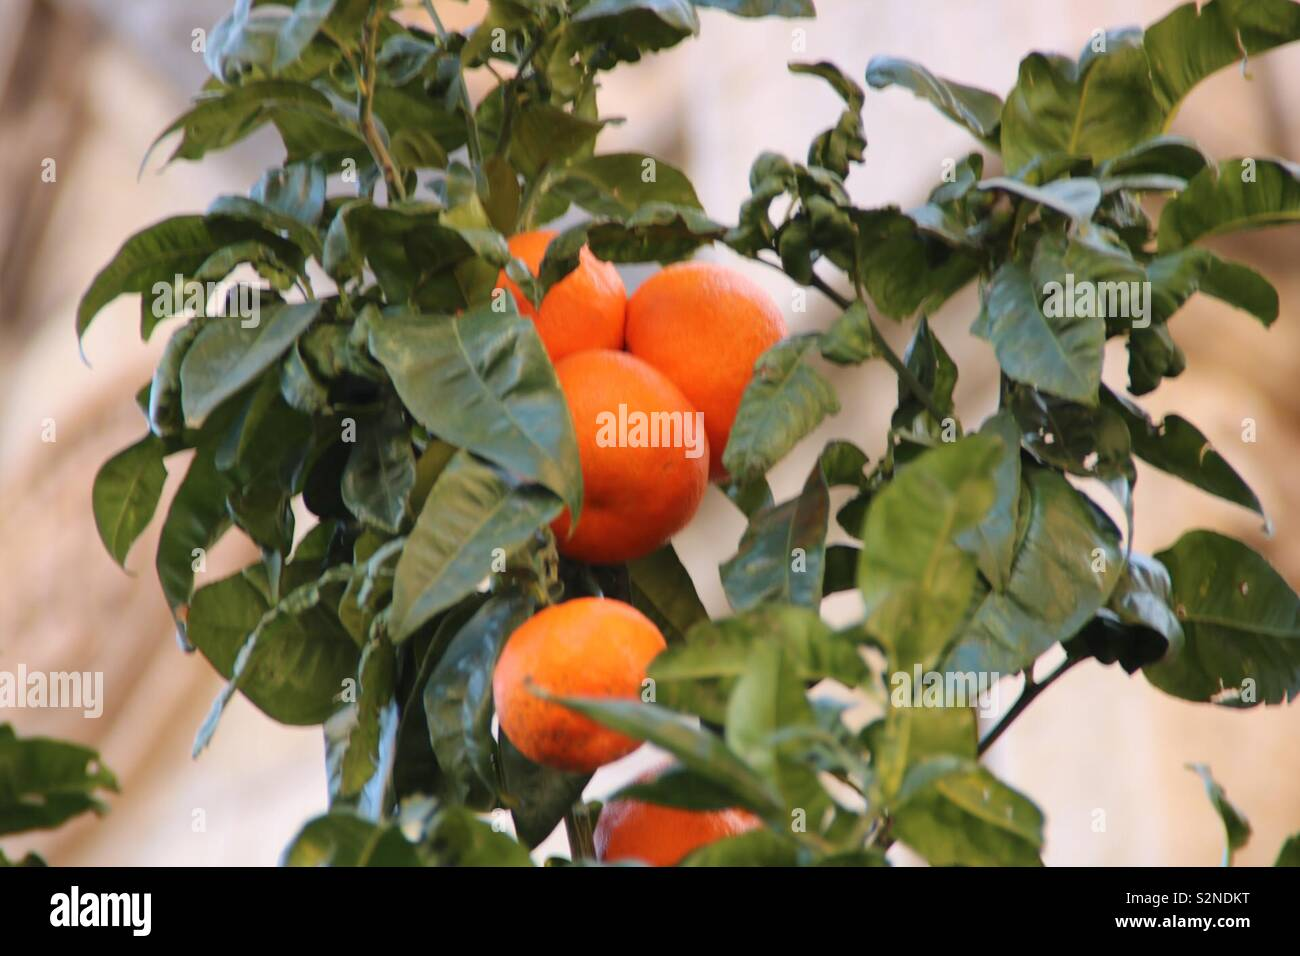 Orangen am Baum - oranges at a tree - Stock Image